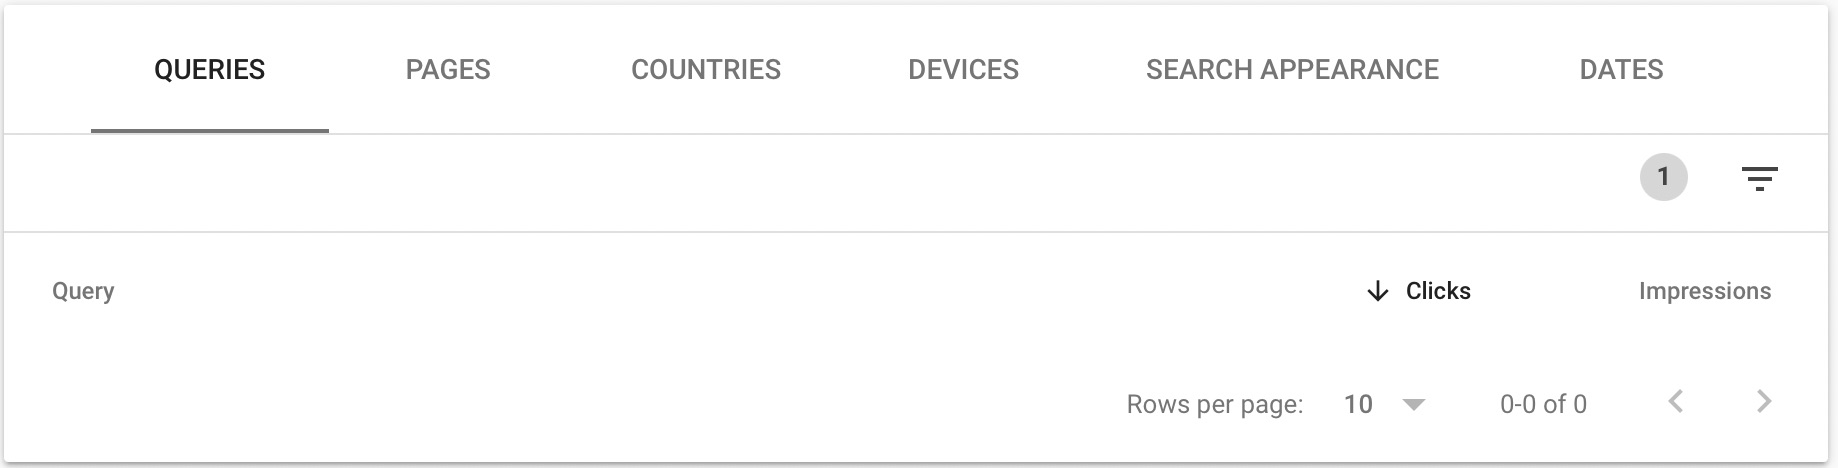 No data reported in Google Search Console